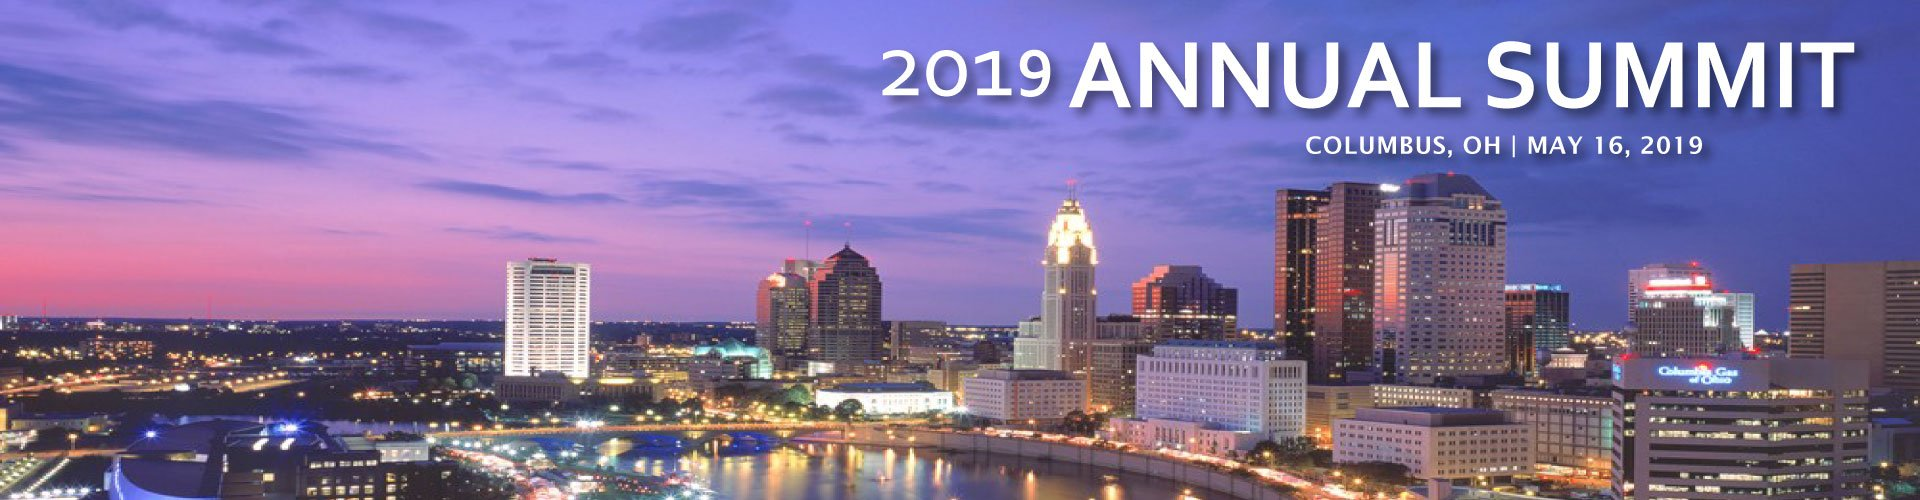 2019 Annual Meeting, Columbus, OH